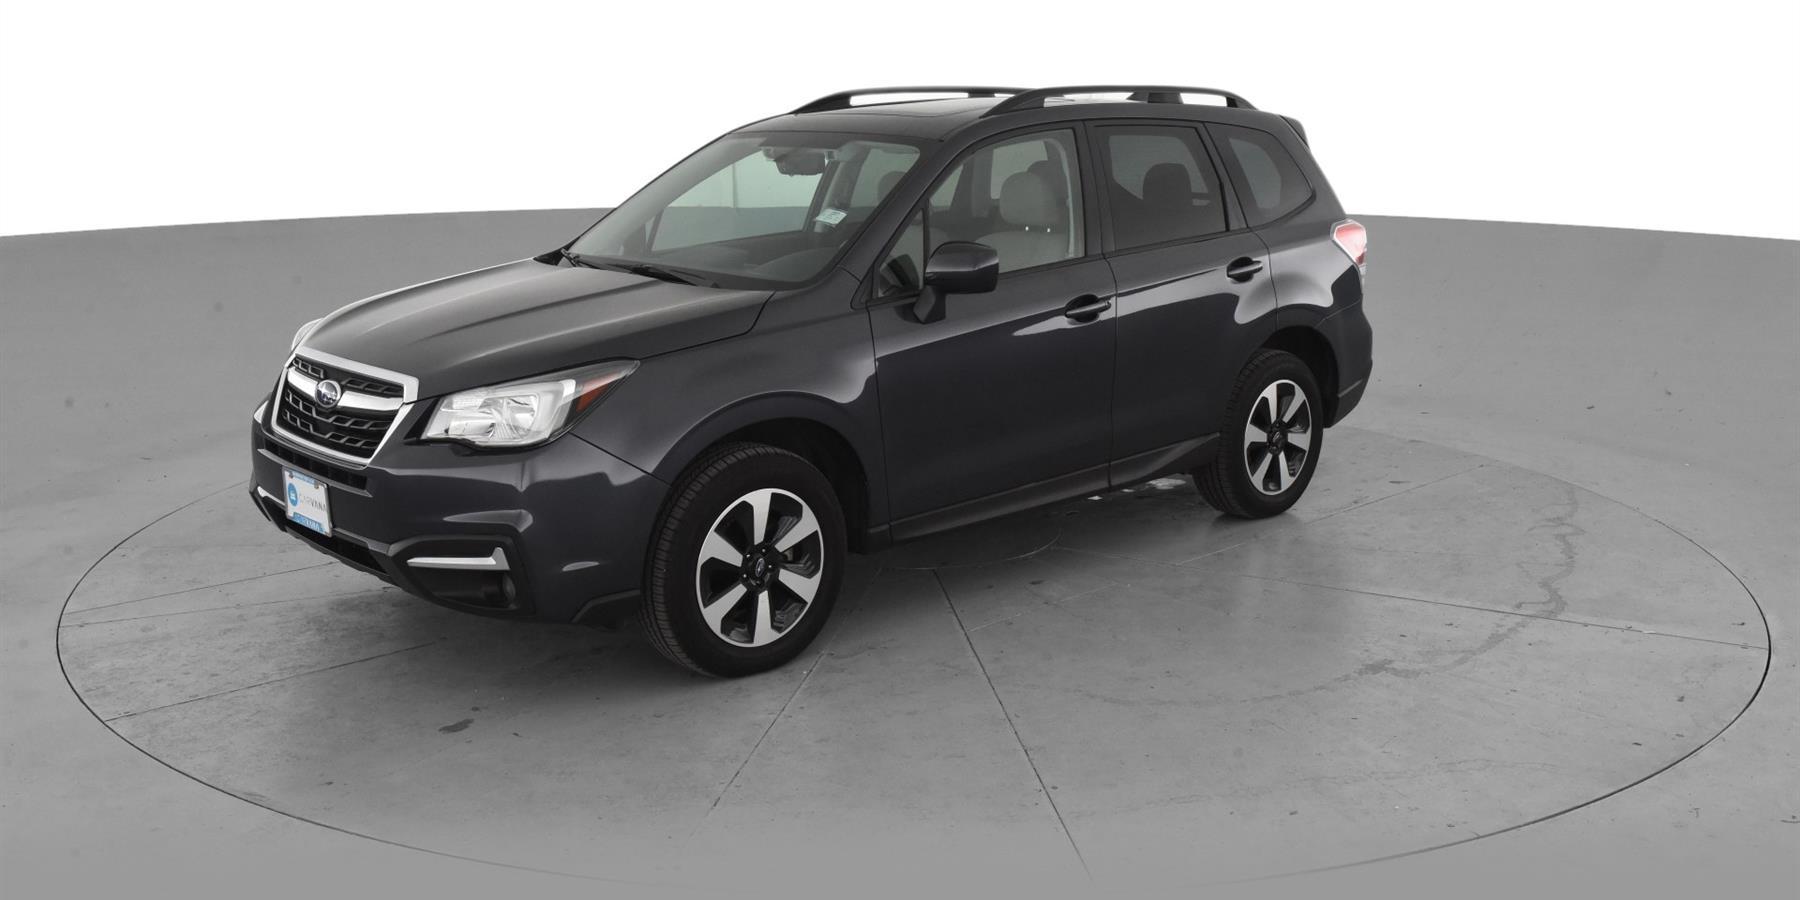 2018 Subaru Forester 2 5i Premium Sport Utility 4D for Sale